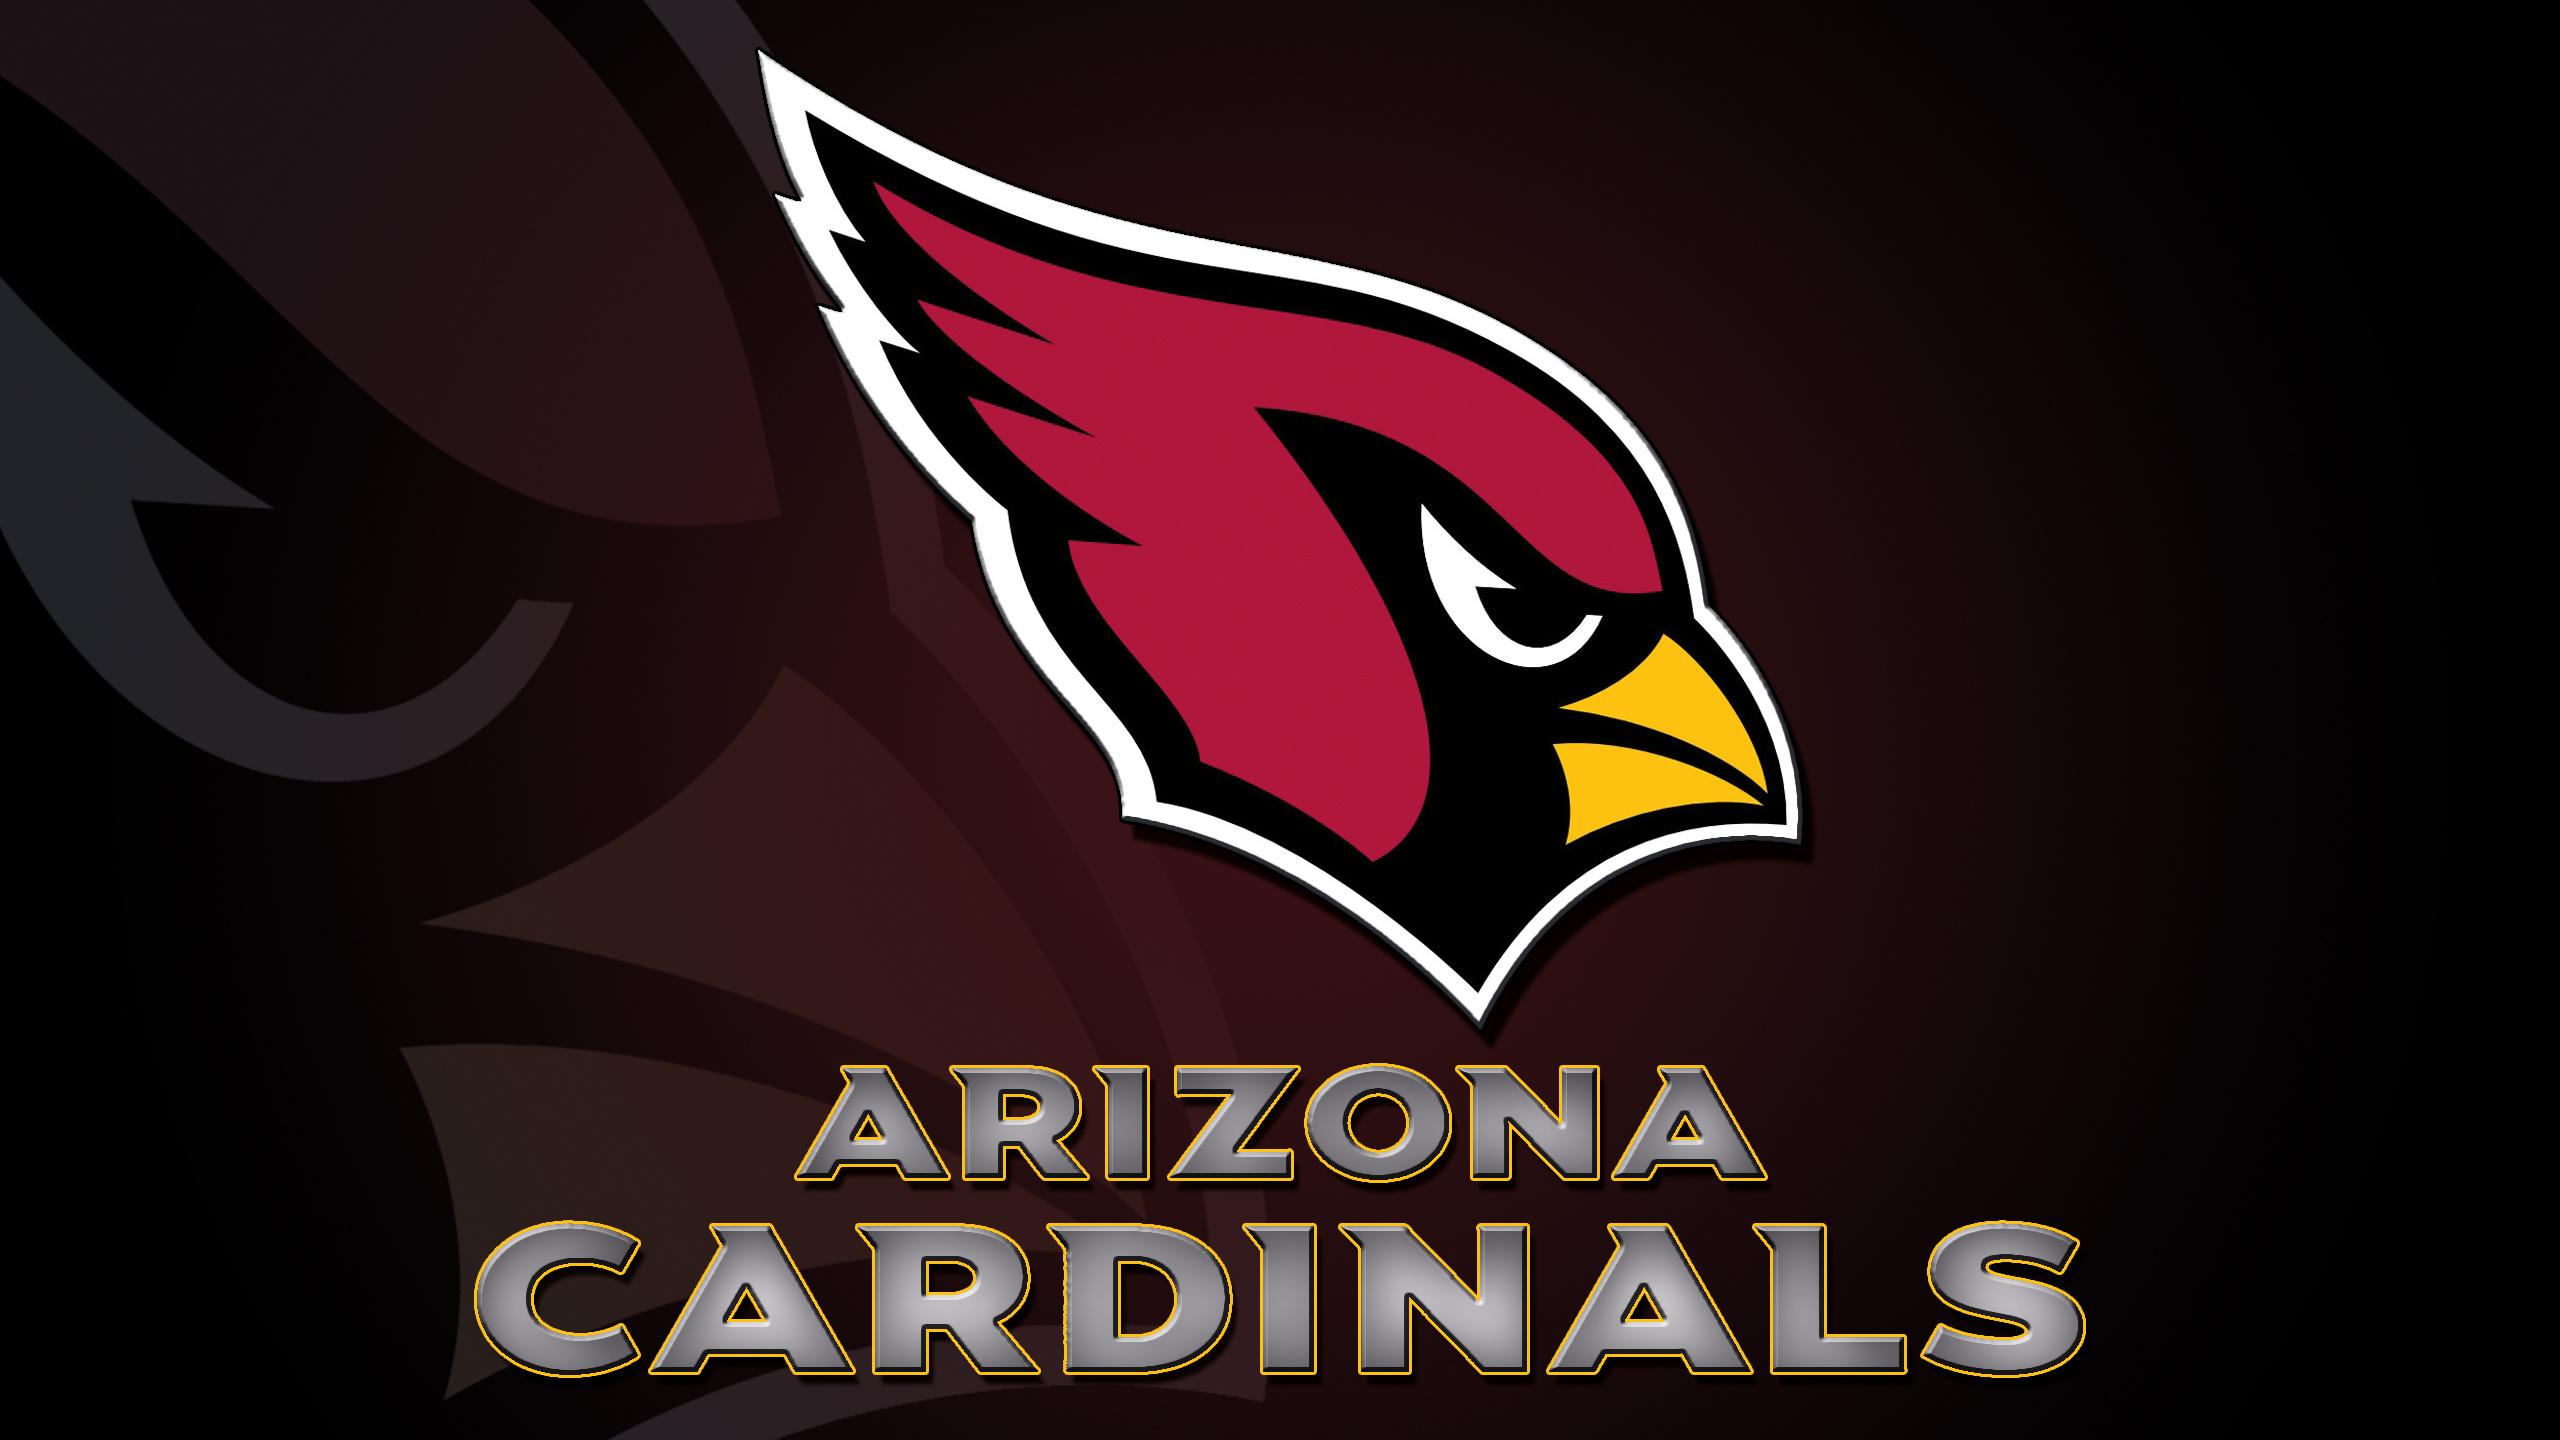 Arizona Cardinals By Beaware8 On Deviantart